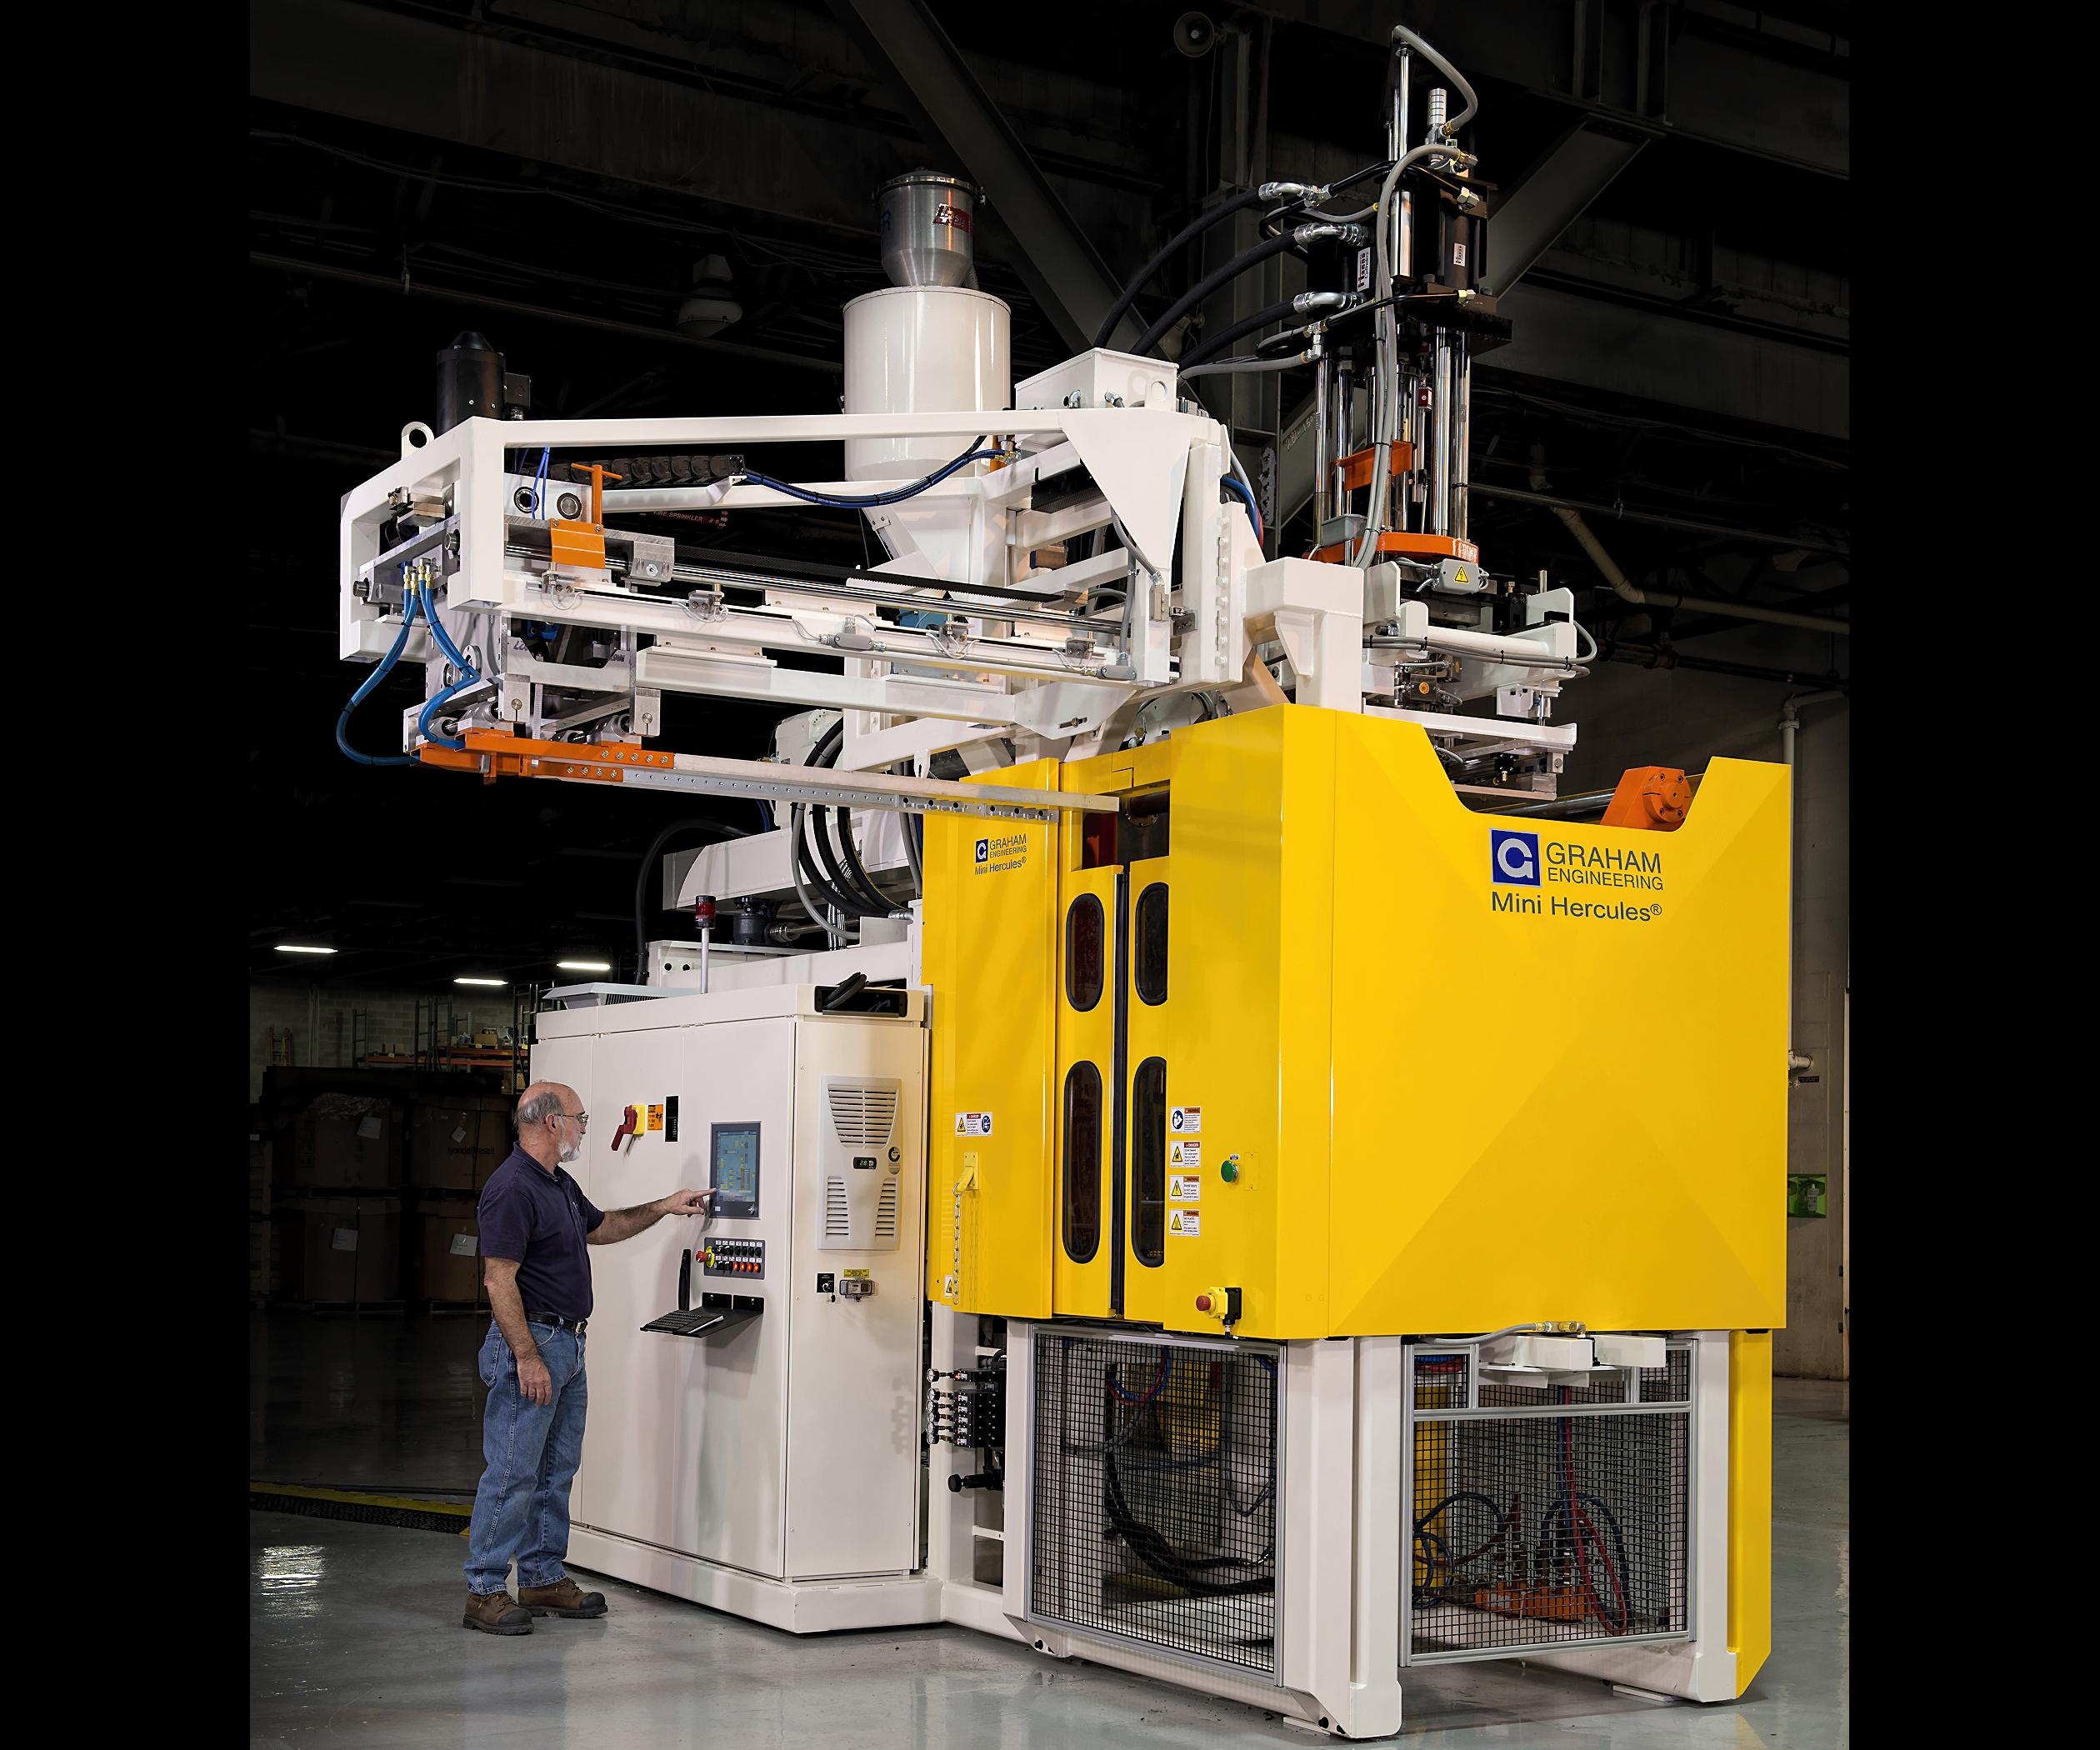 Graham Engineering Mini Hercules accumulator blow molder